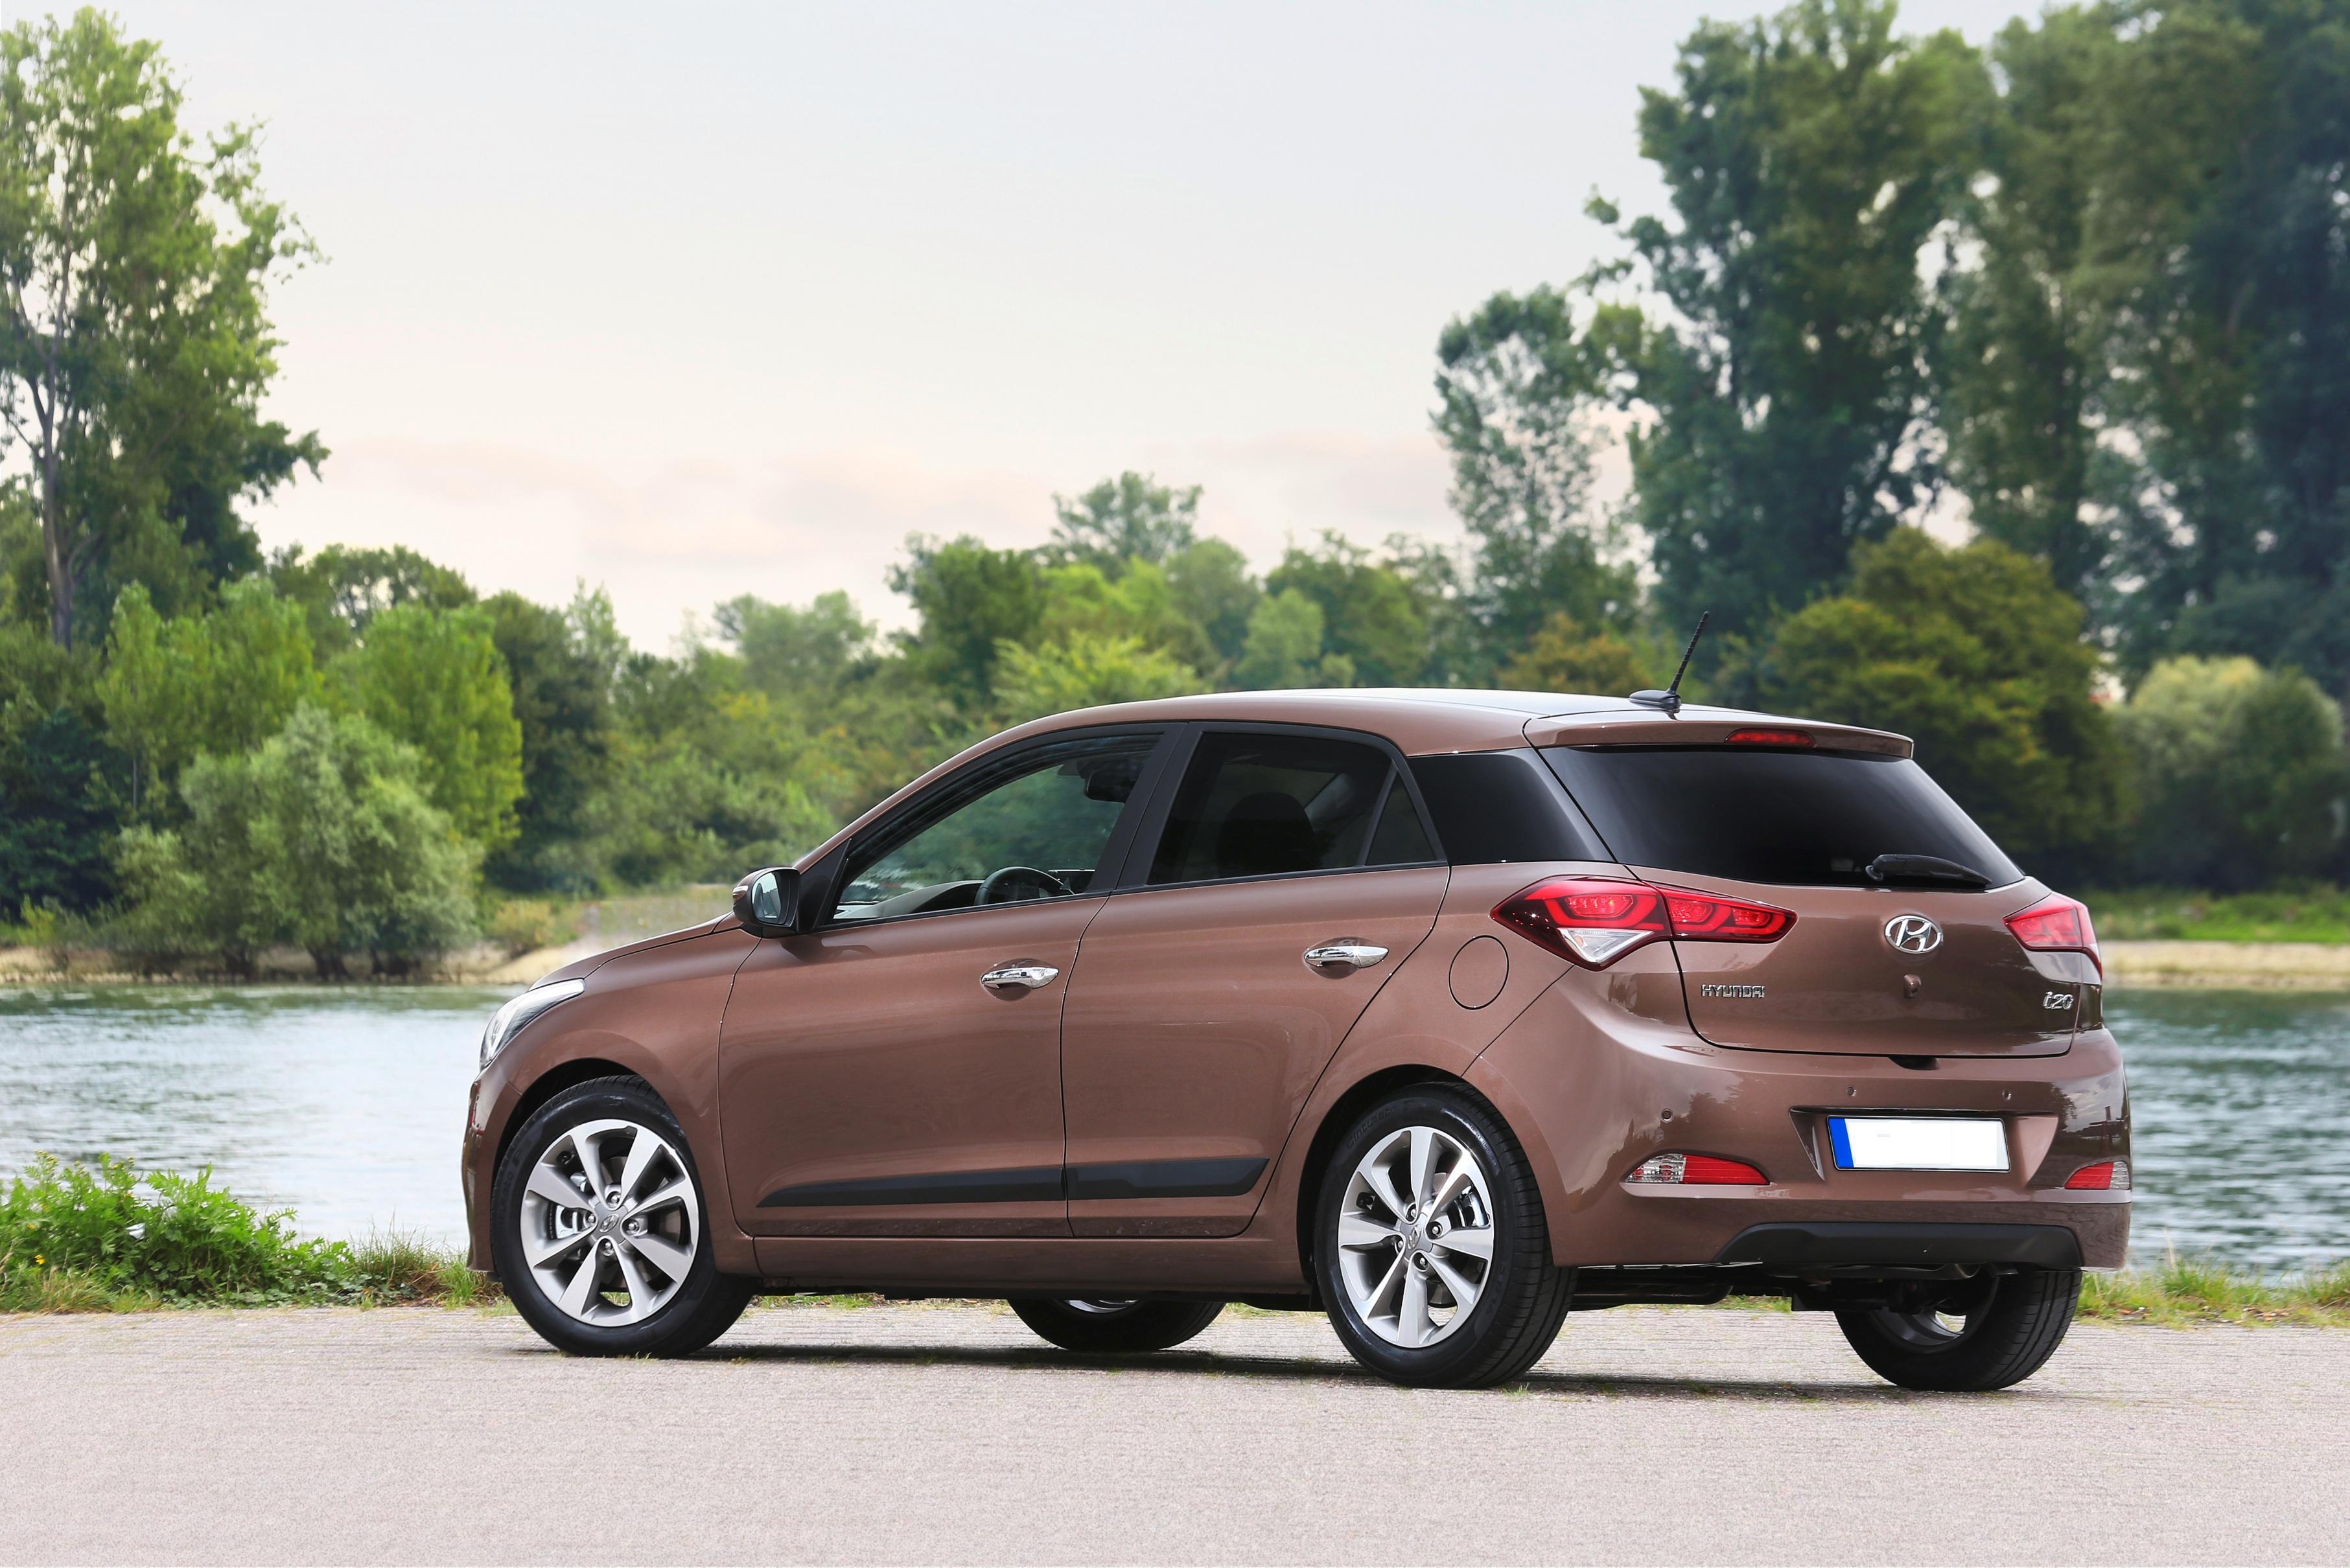 Noua Generație Hyundai I20 Are